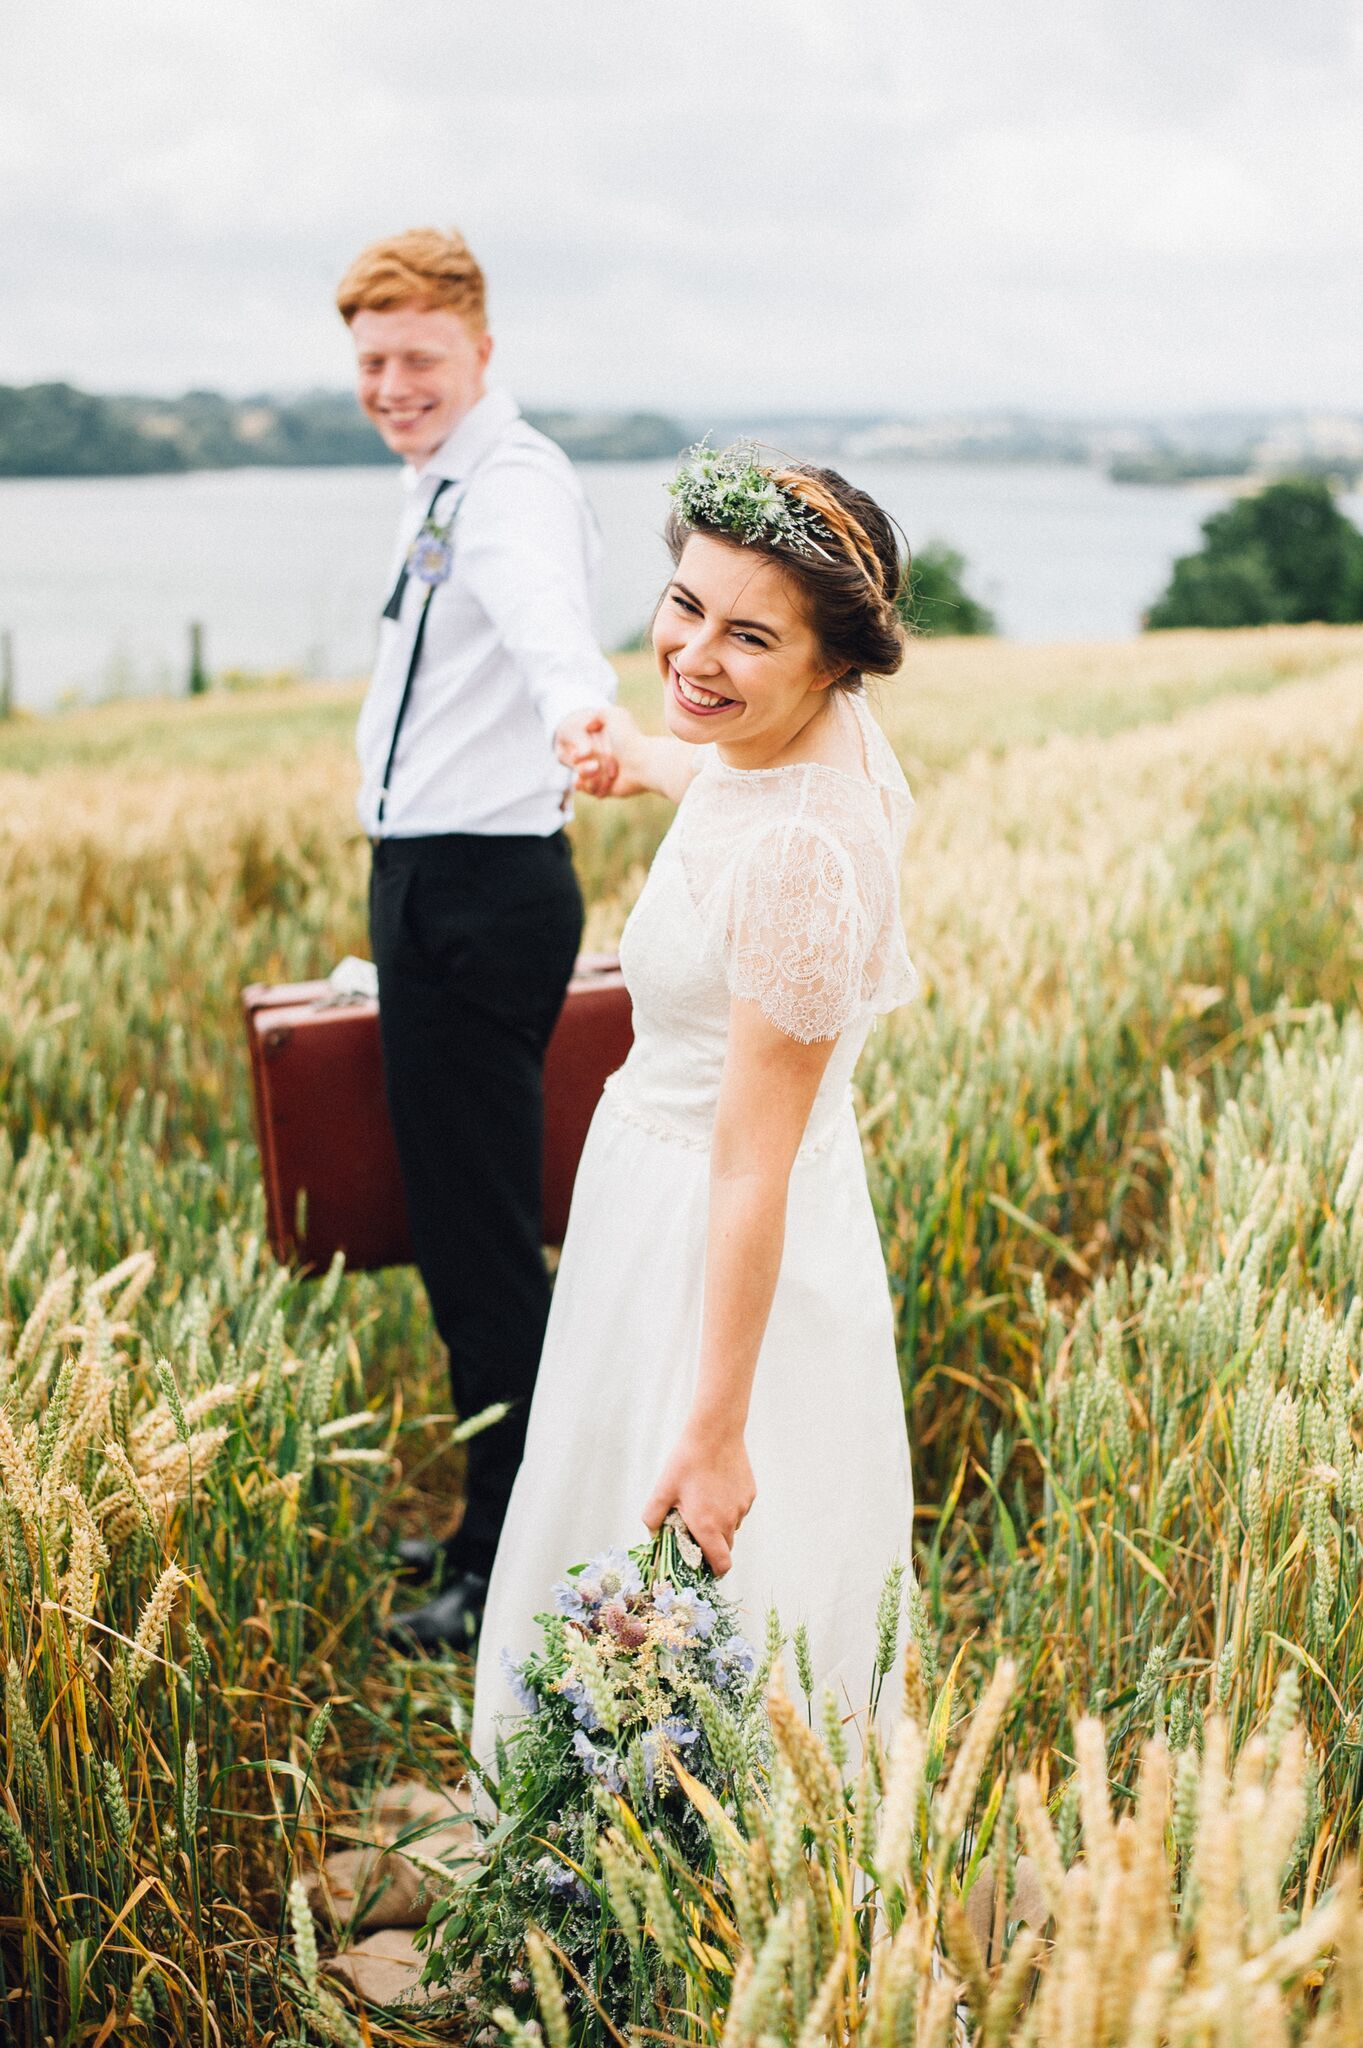 English elopement wedding flowers wedding elopement styled shoot